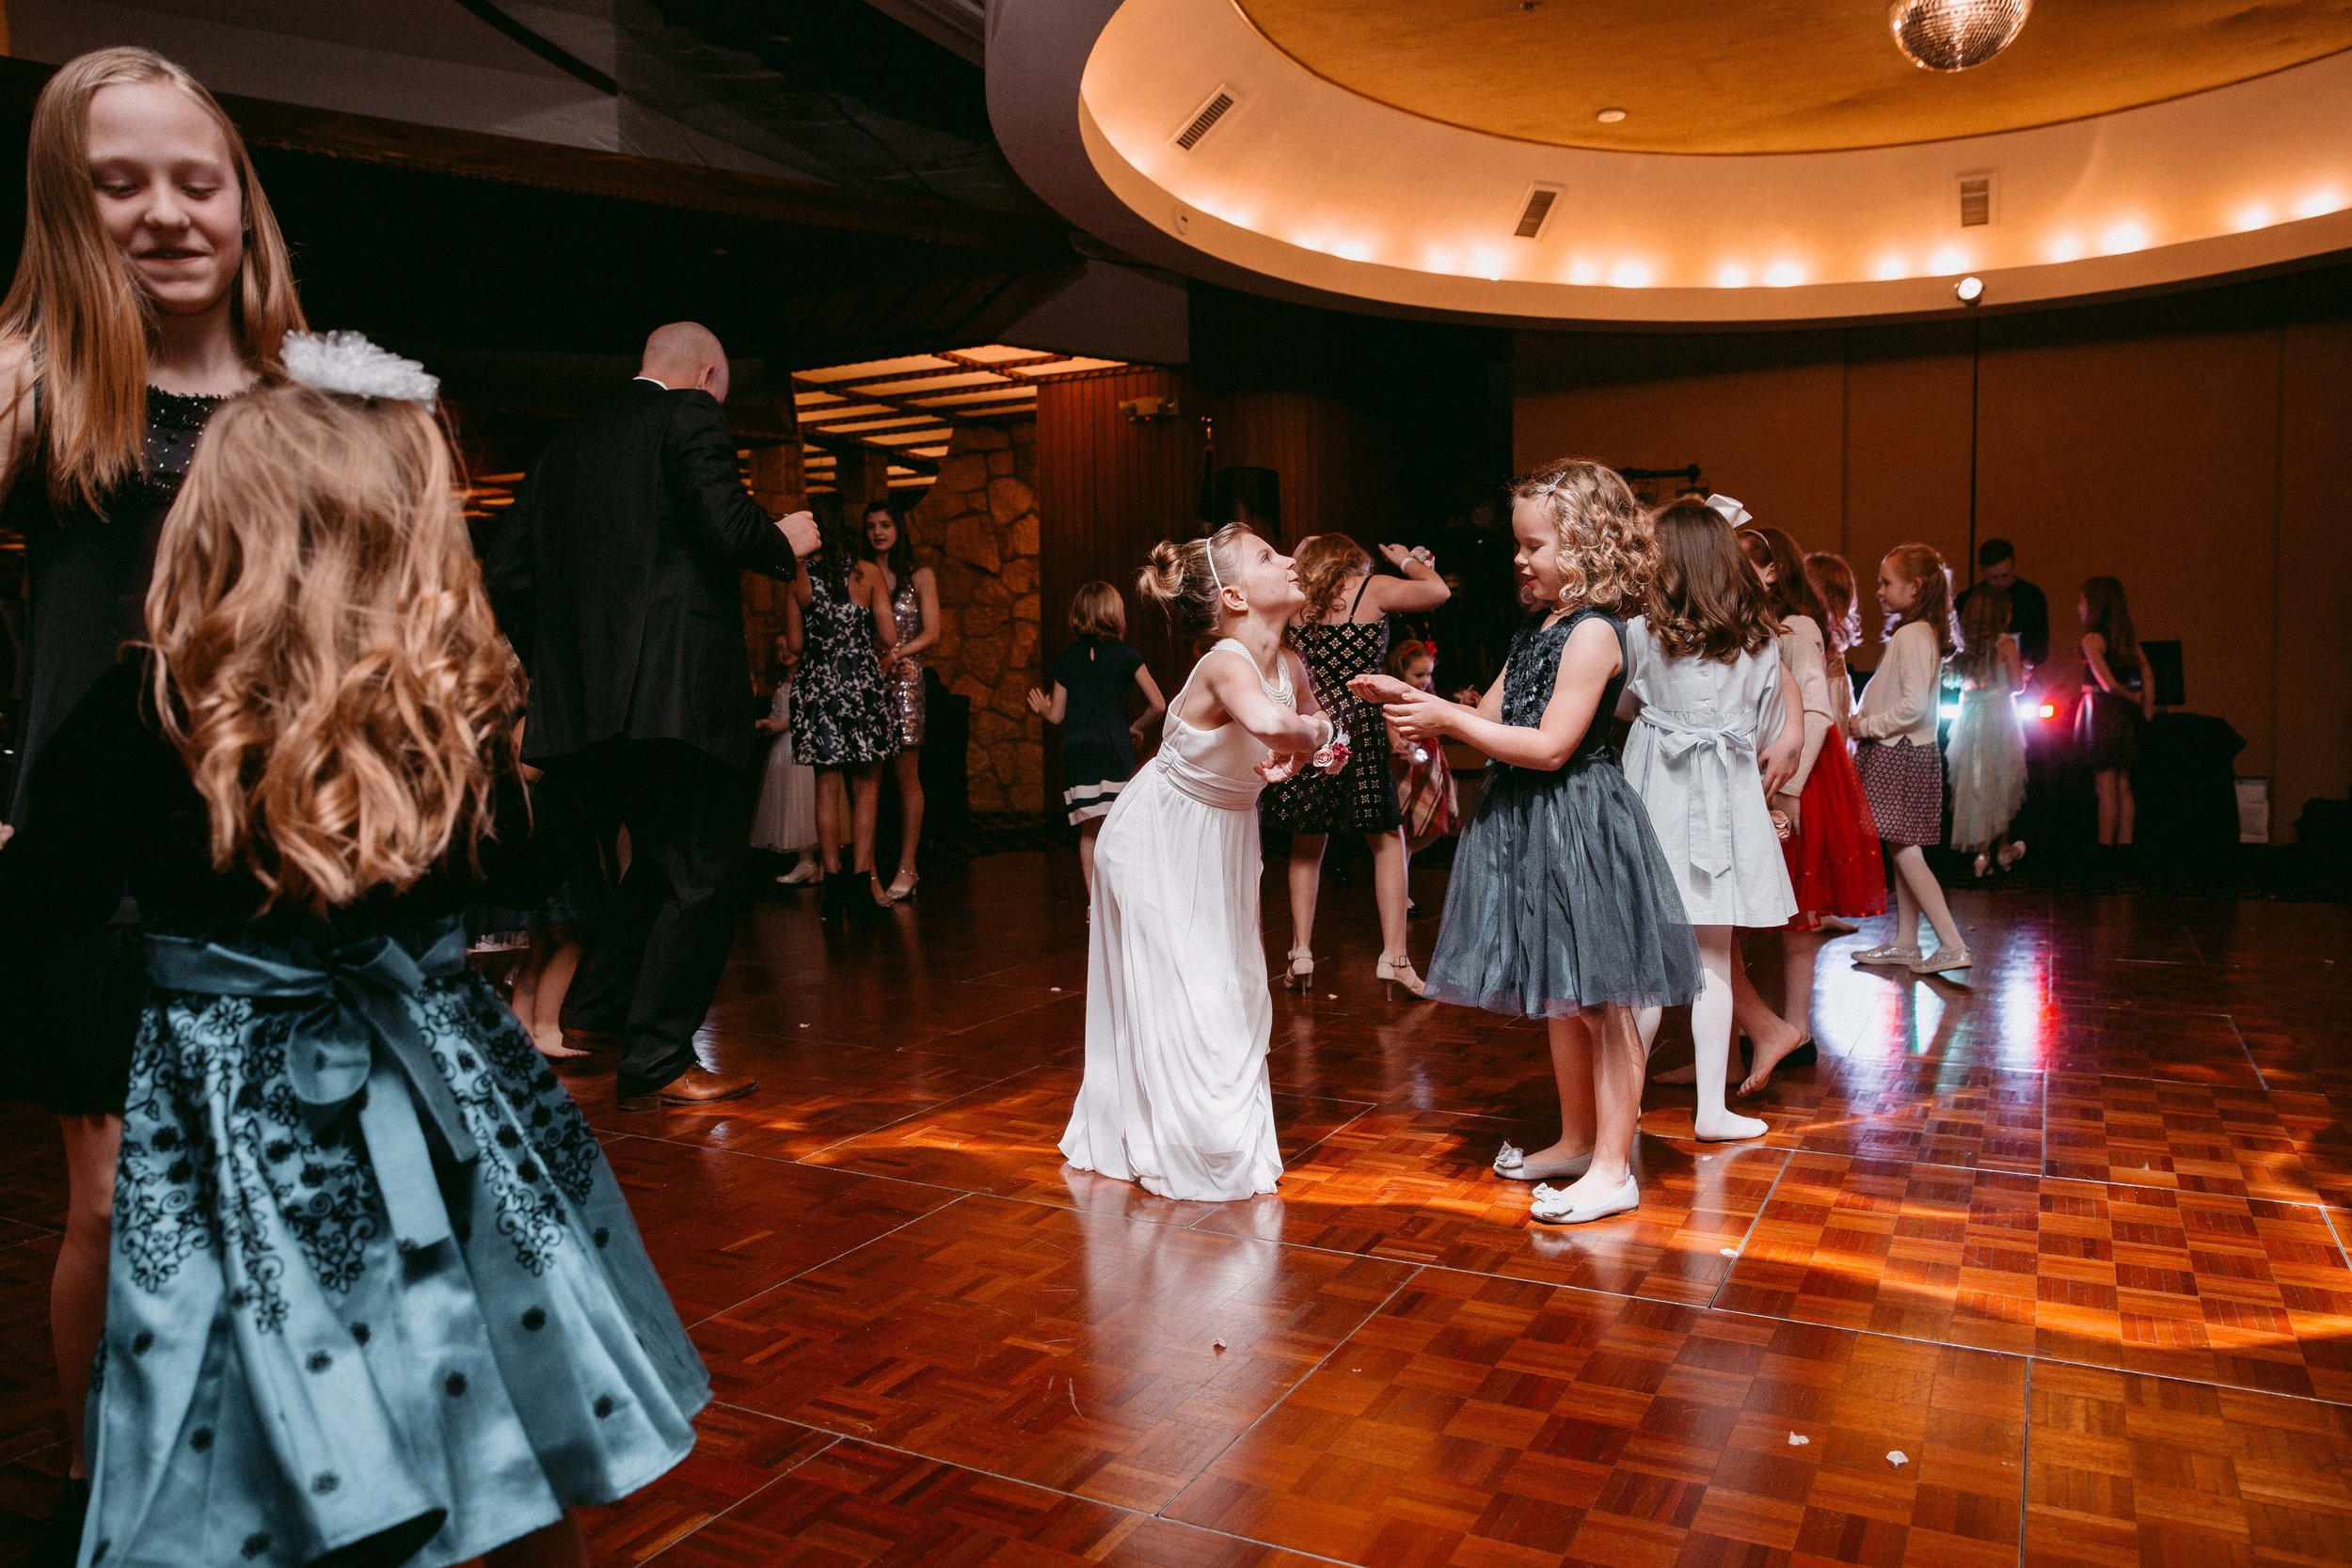 quailcreek_fatherdaughterdance_2017_highfivemedia_photography12.jpg